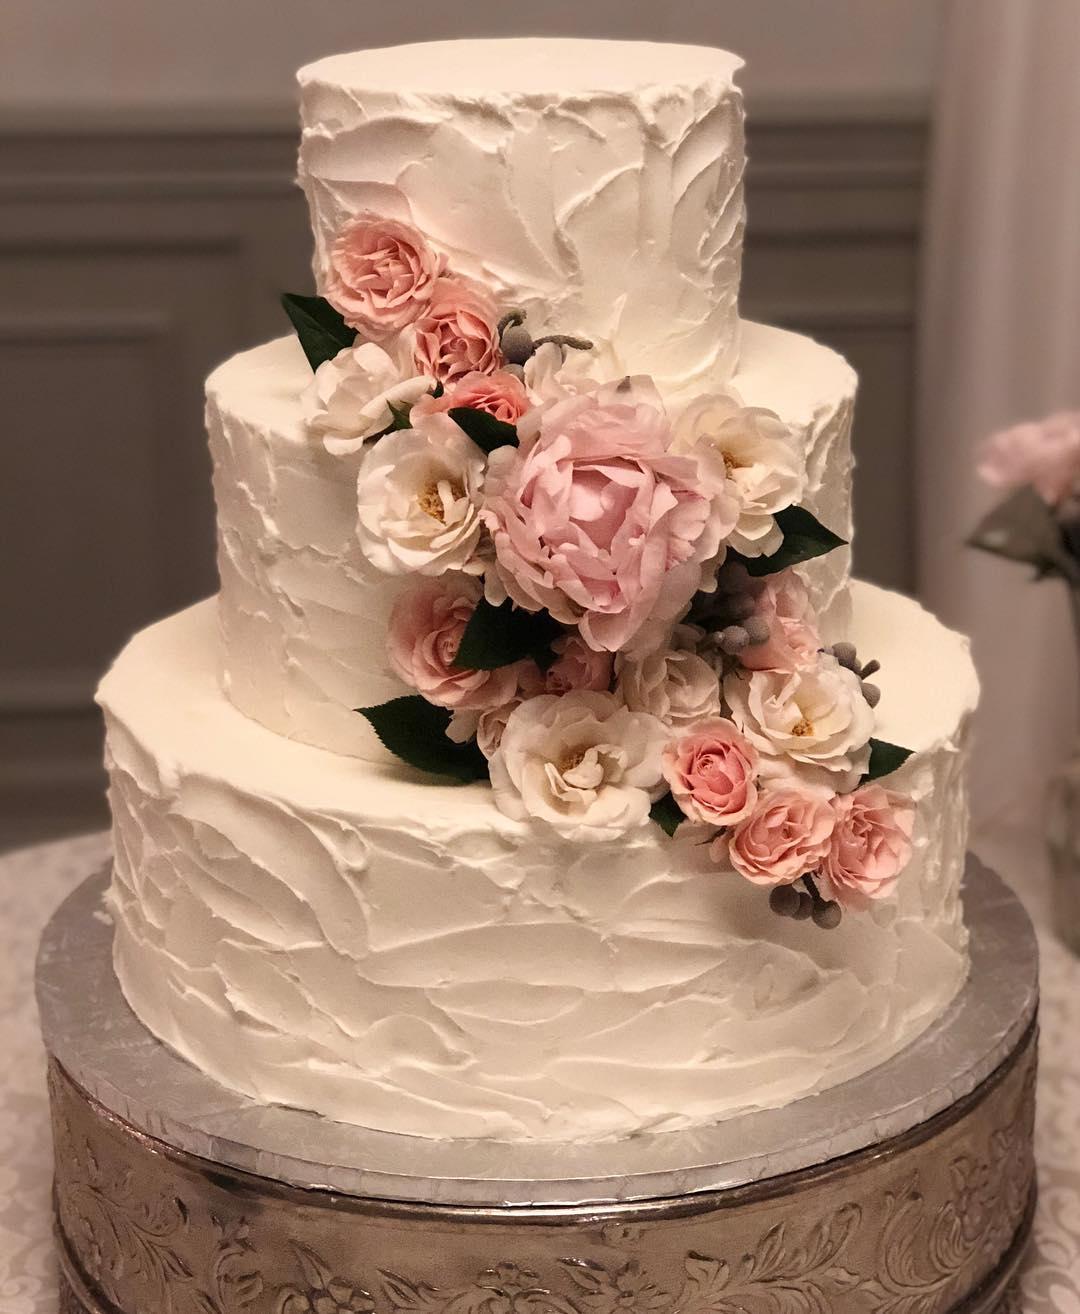 #weddingcake #cakestagram #cakesofinstagram